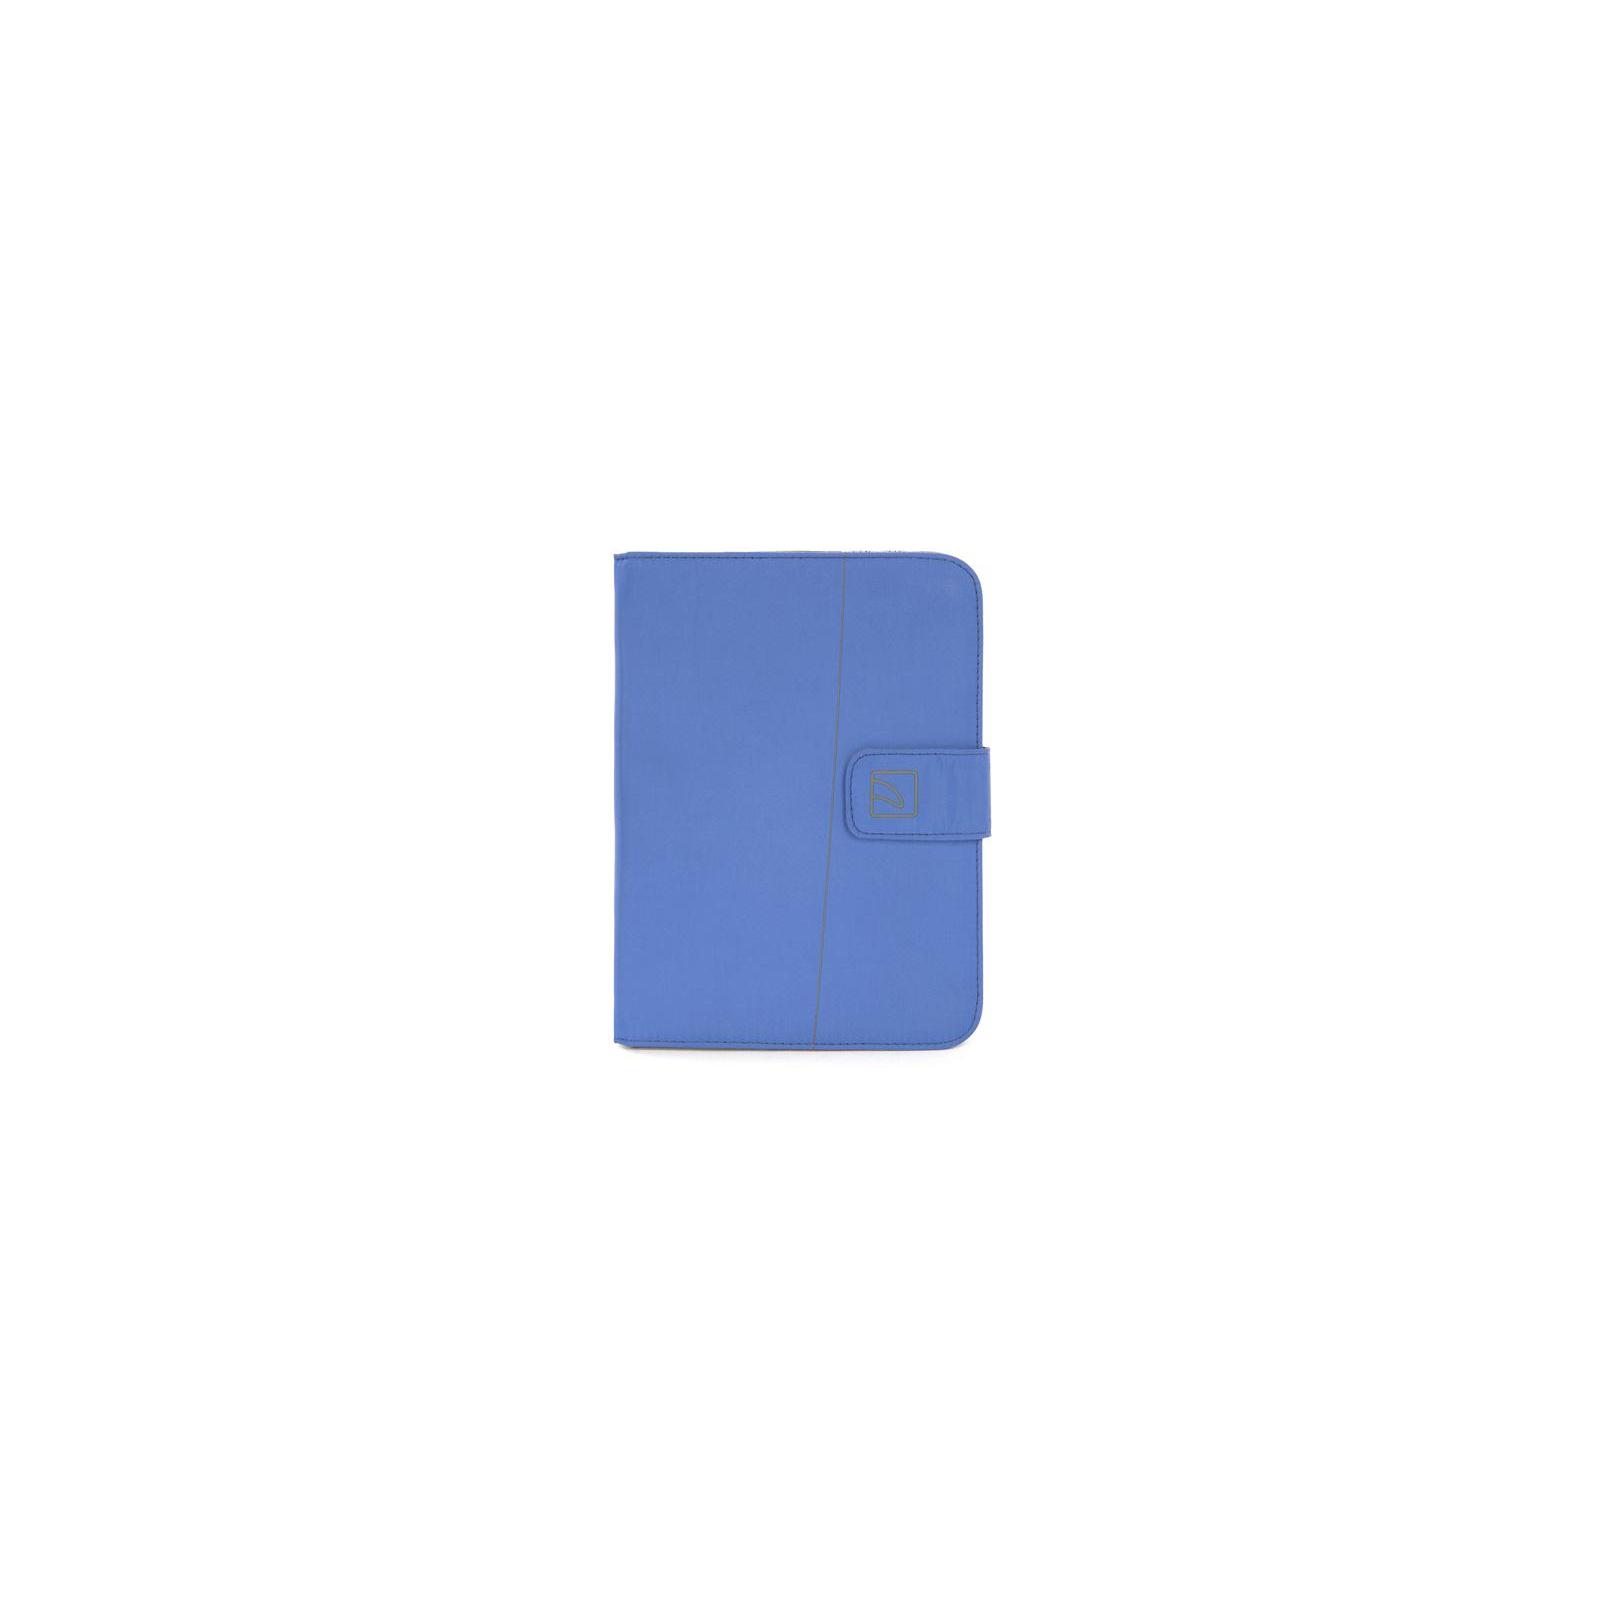 "Чехол для планшета Tucano 7"" Facile Stand Blue (TAB-FA7-B)"